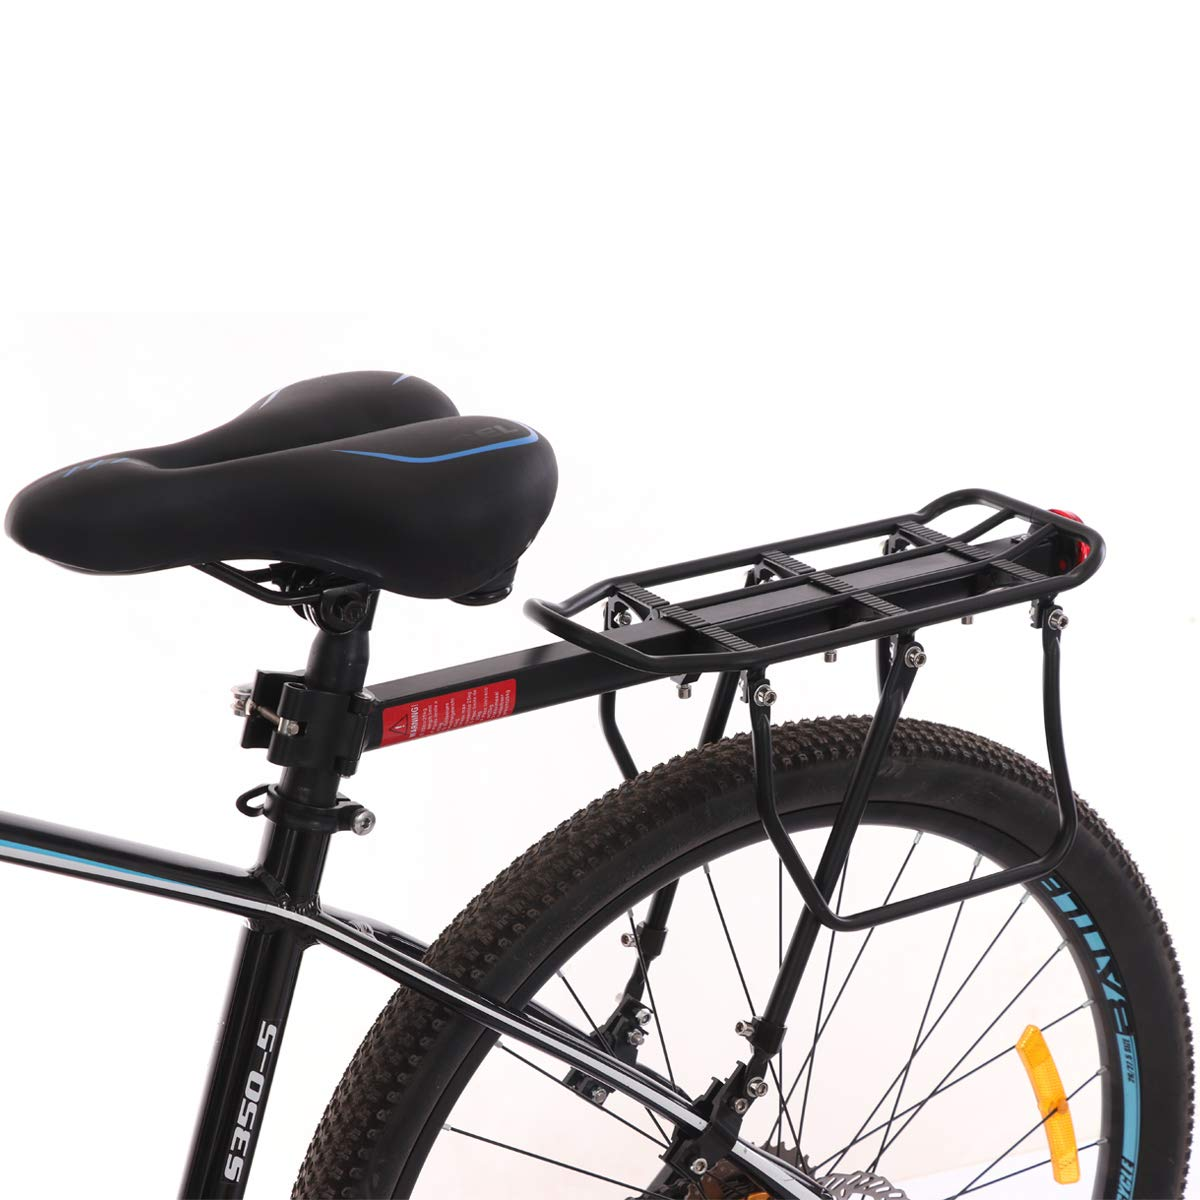 TENGGO Vélo Vélo Mountain Bike Seat Poteau Arrière Rack Support Porte Bagage Charge 50Kg